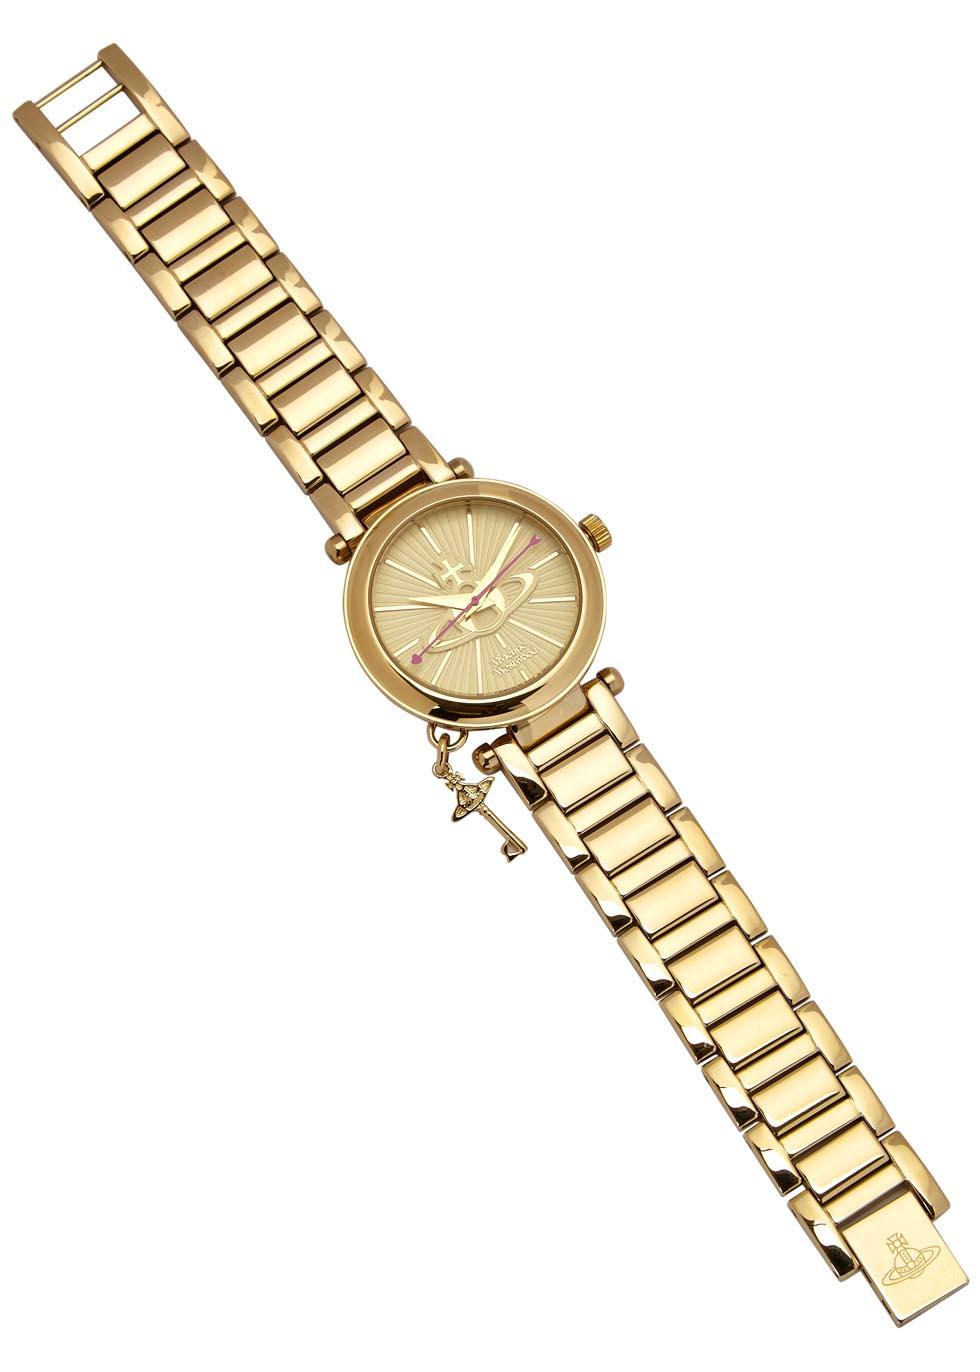 Kensington gold tone watch - Vivienne Westwood